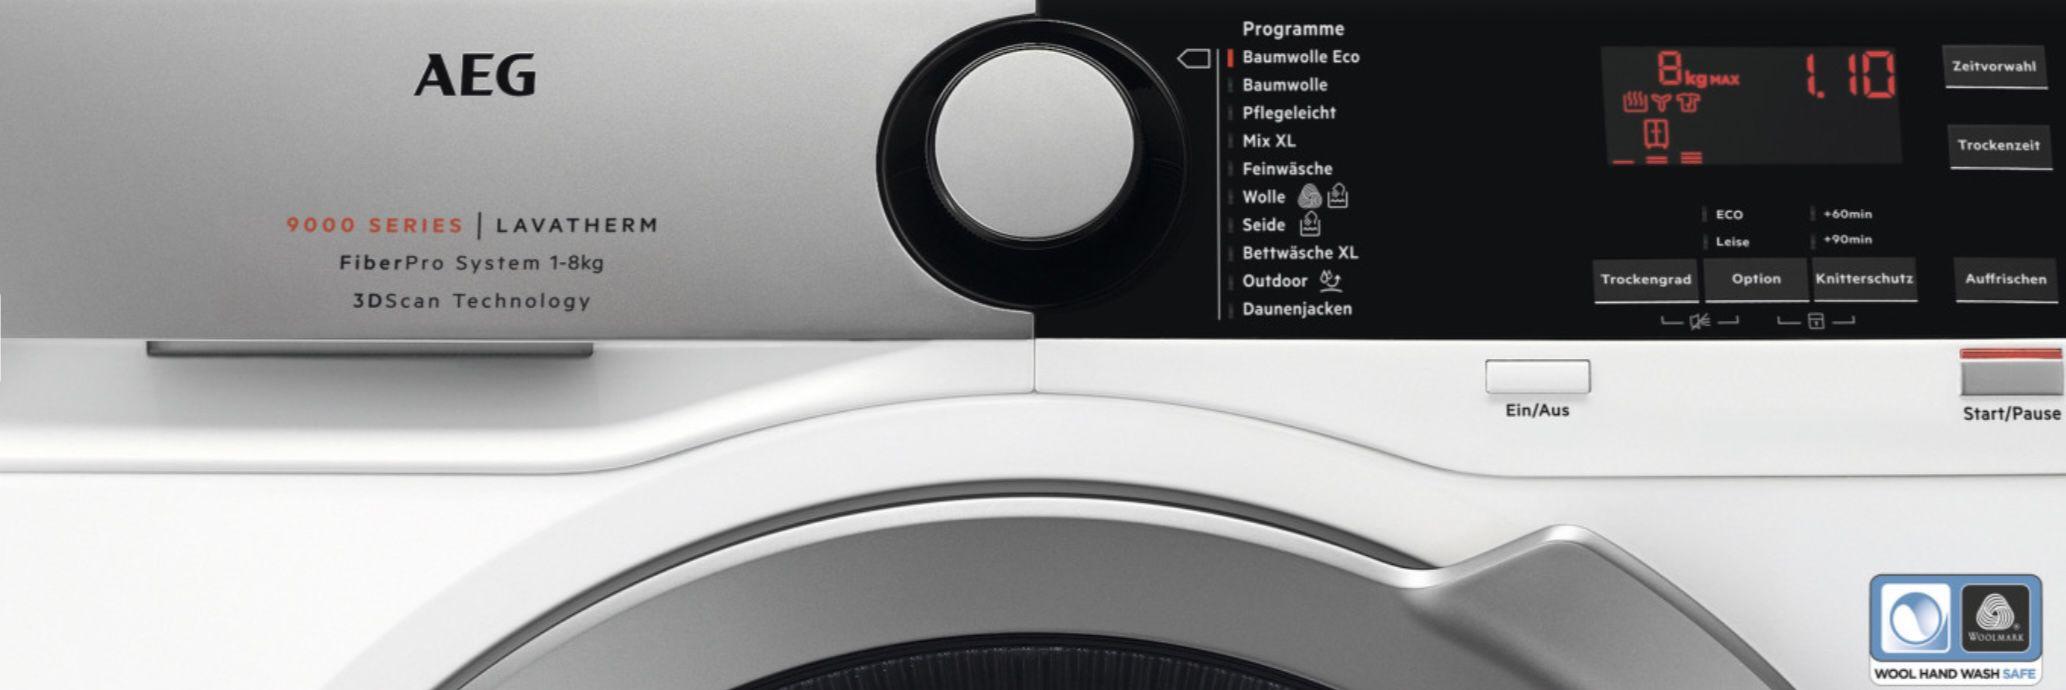 AEG T9DE78685 8kg Wärmepumpentrockner für 654€ (statt 789€)